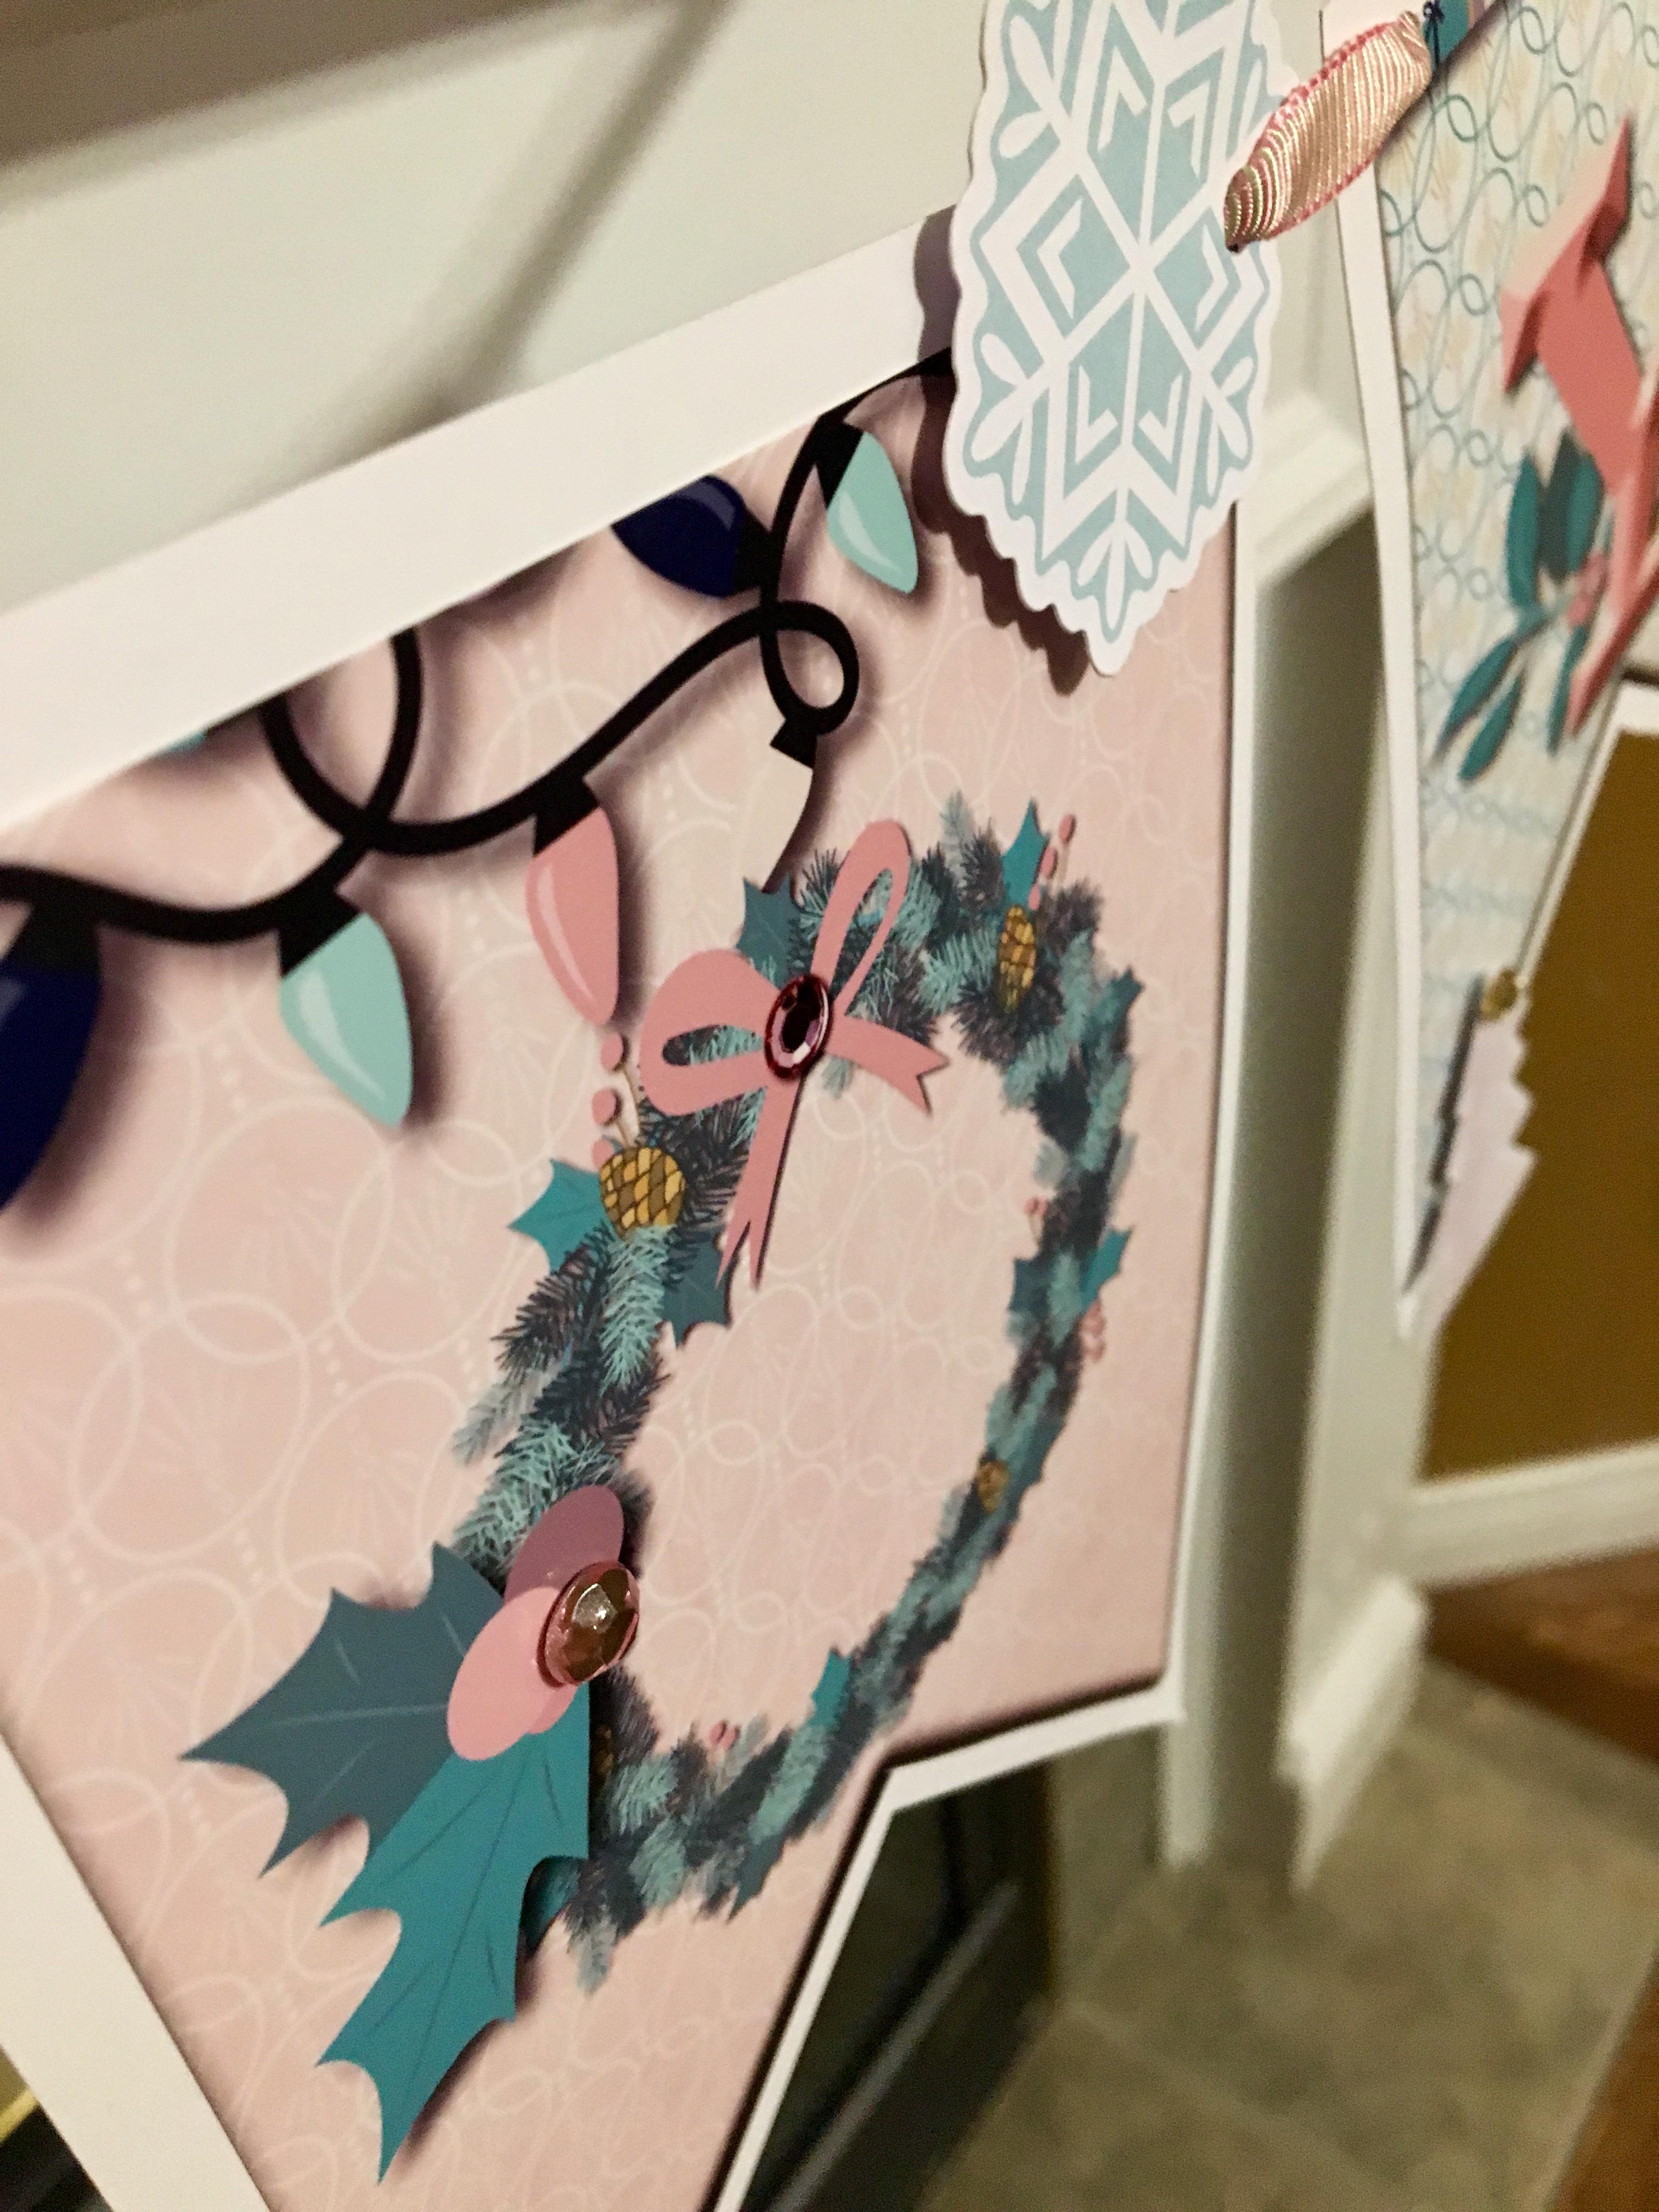 Sugarplum-Banner-Hybrid-Style-Creative-Memories